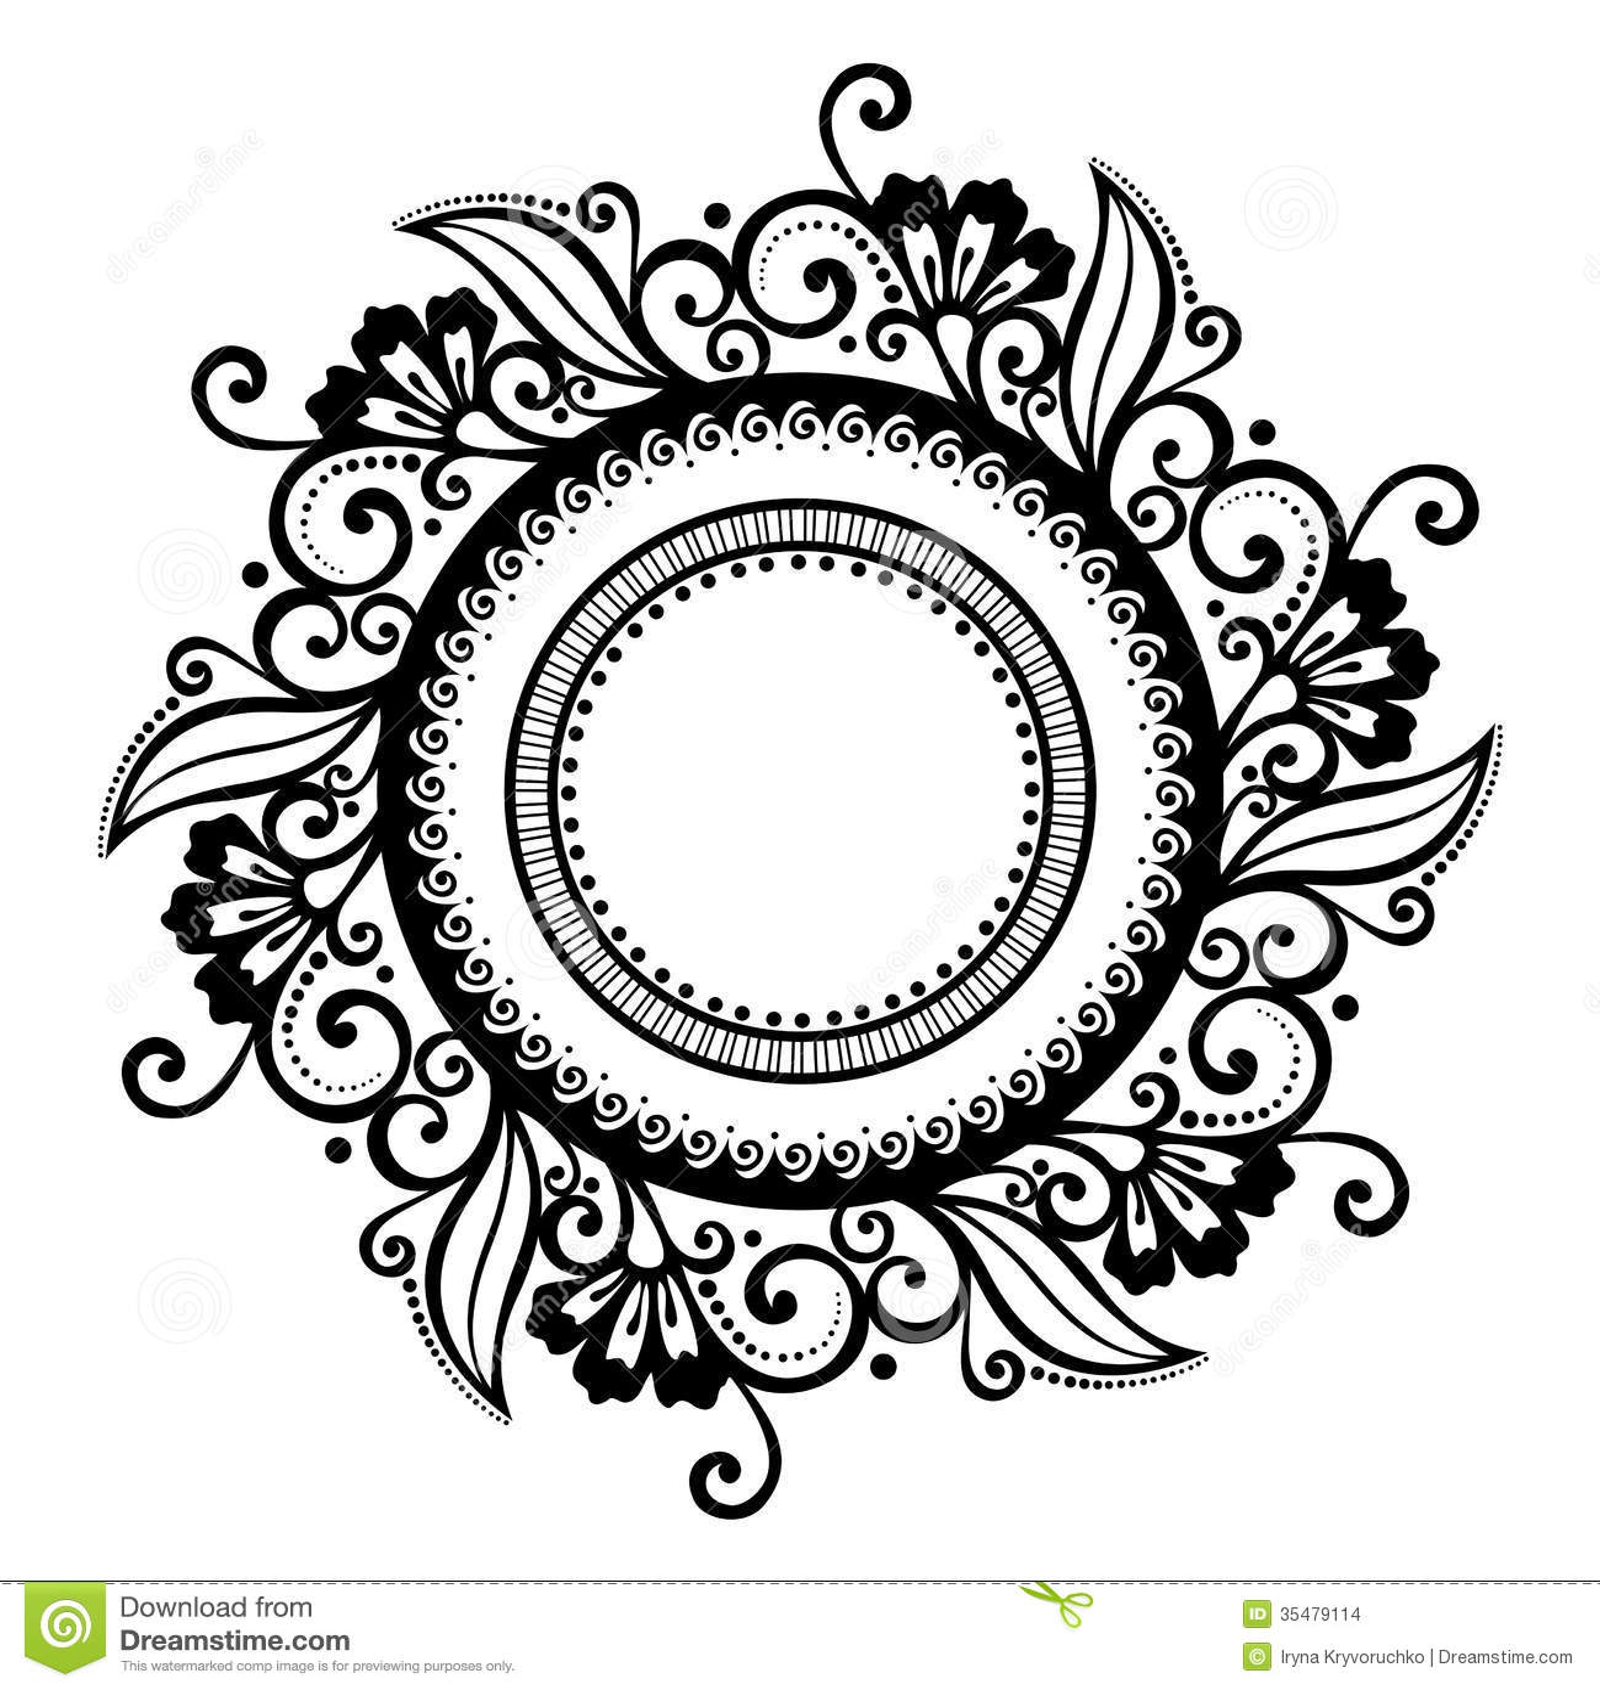 Ornamental design download